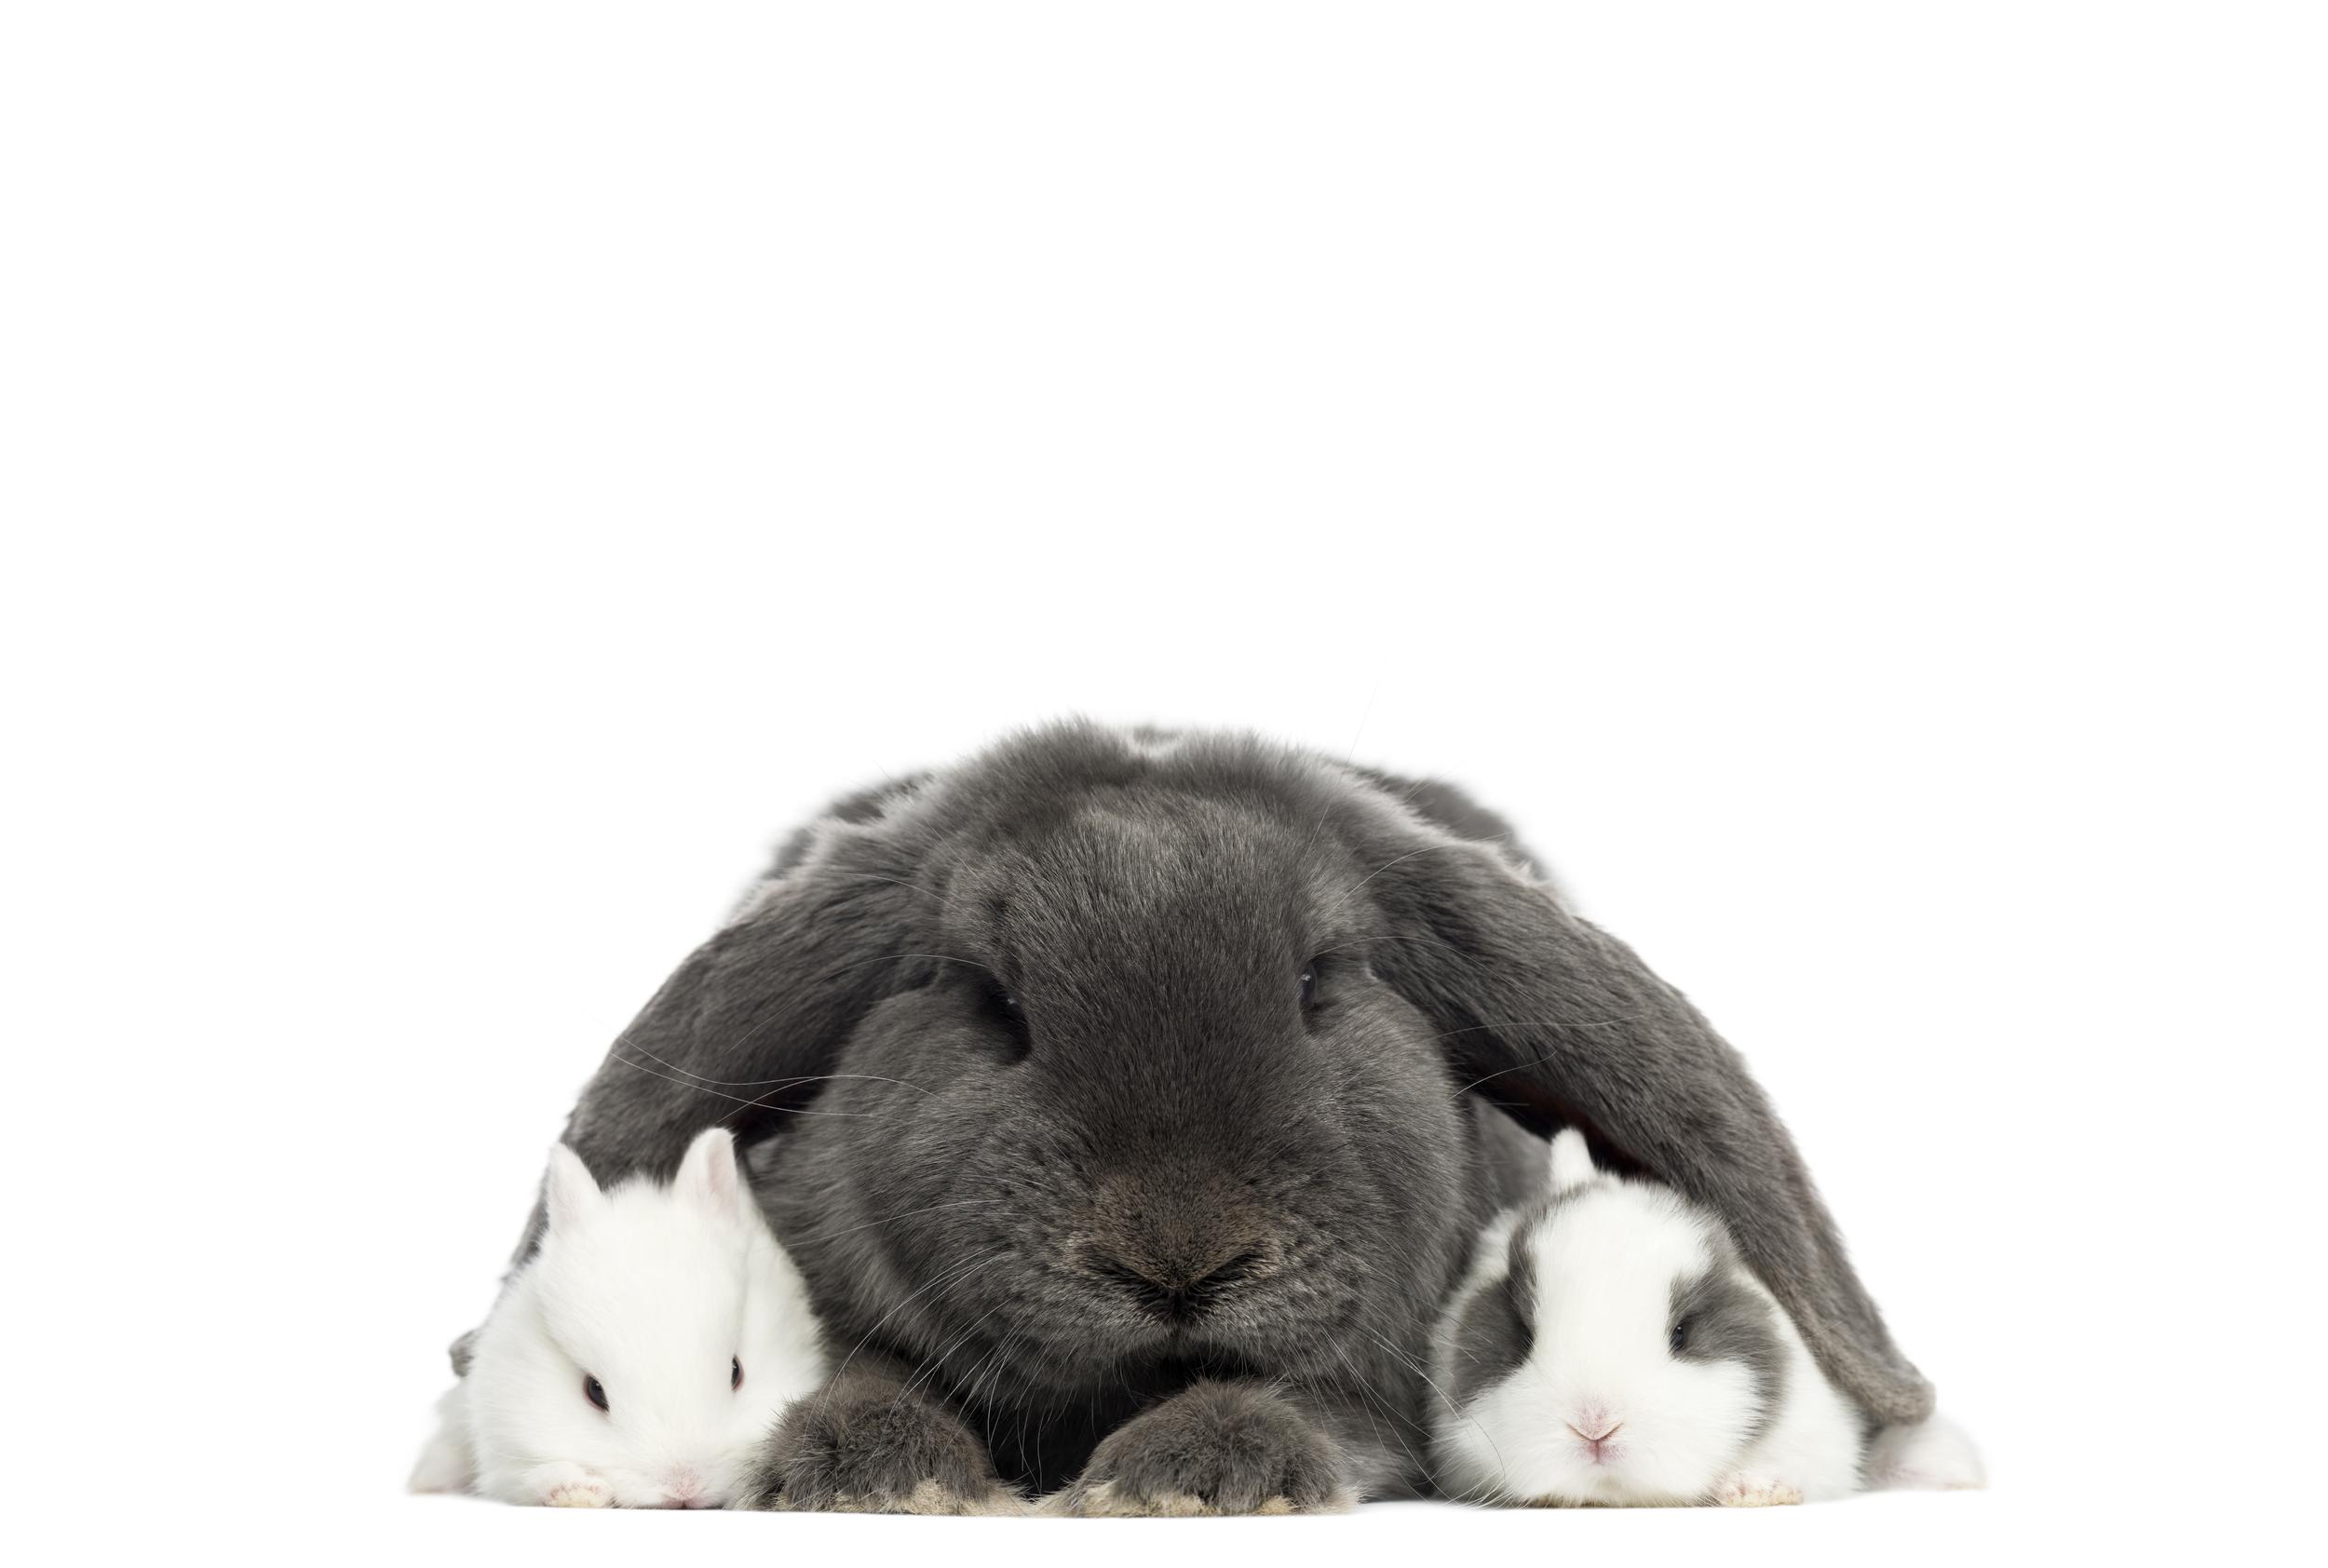 National Hamster Council    Guinea Pig Welfare    Rabbit Welfare Association and Fund    Rabbit care guide    Guinea Pig care guide